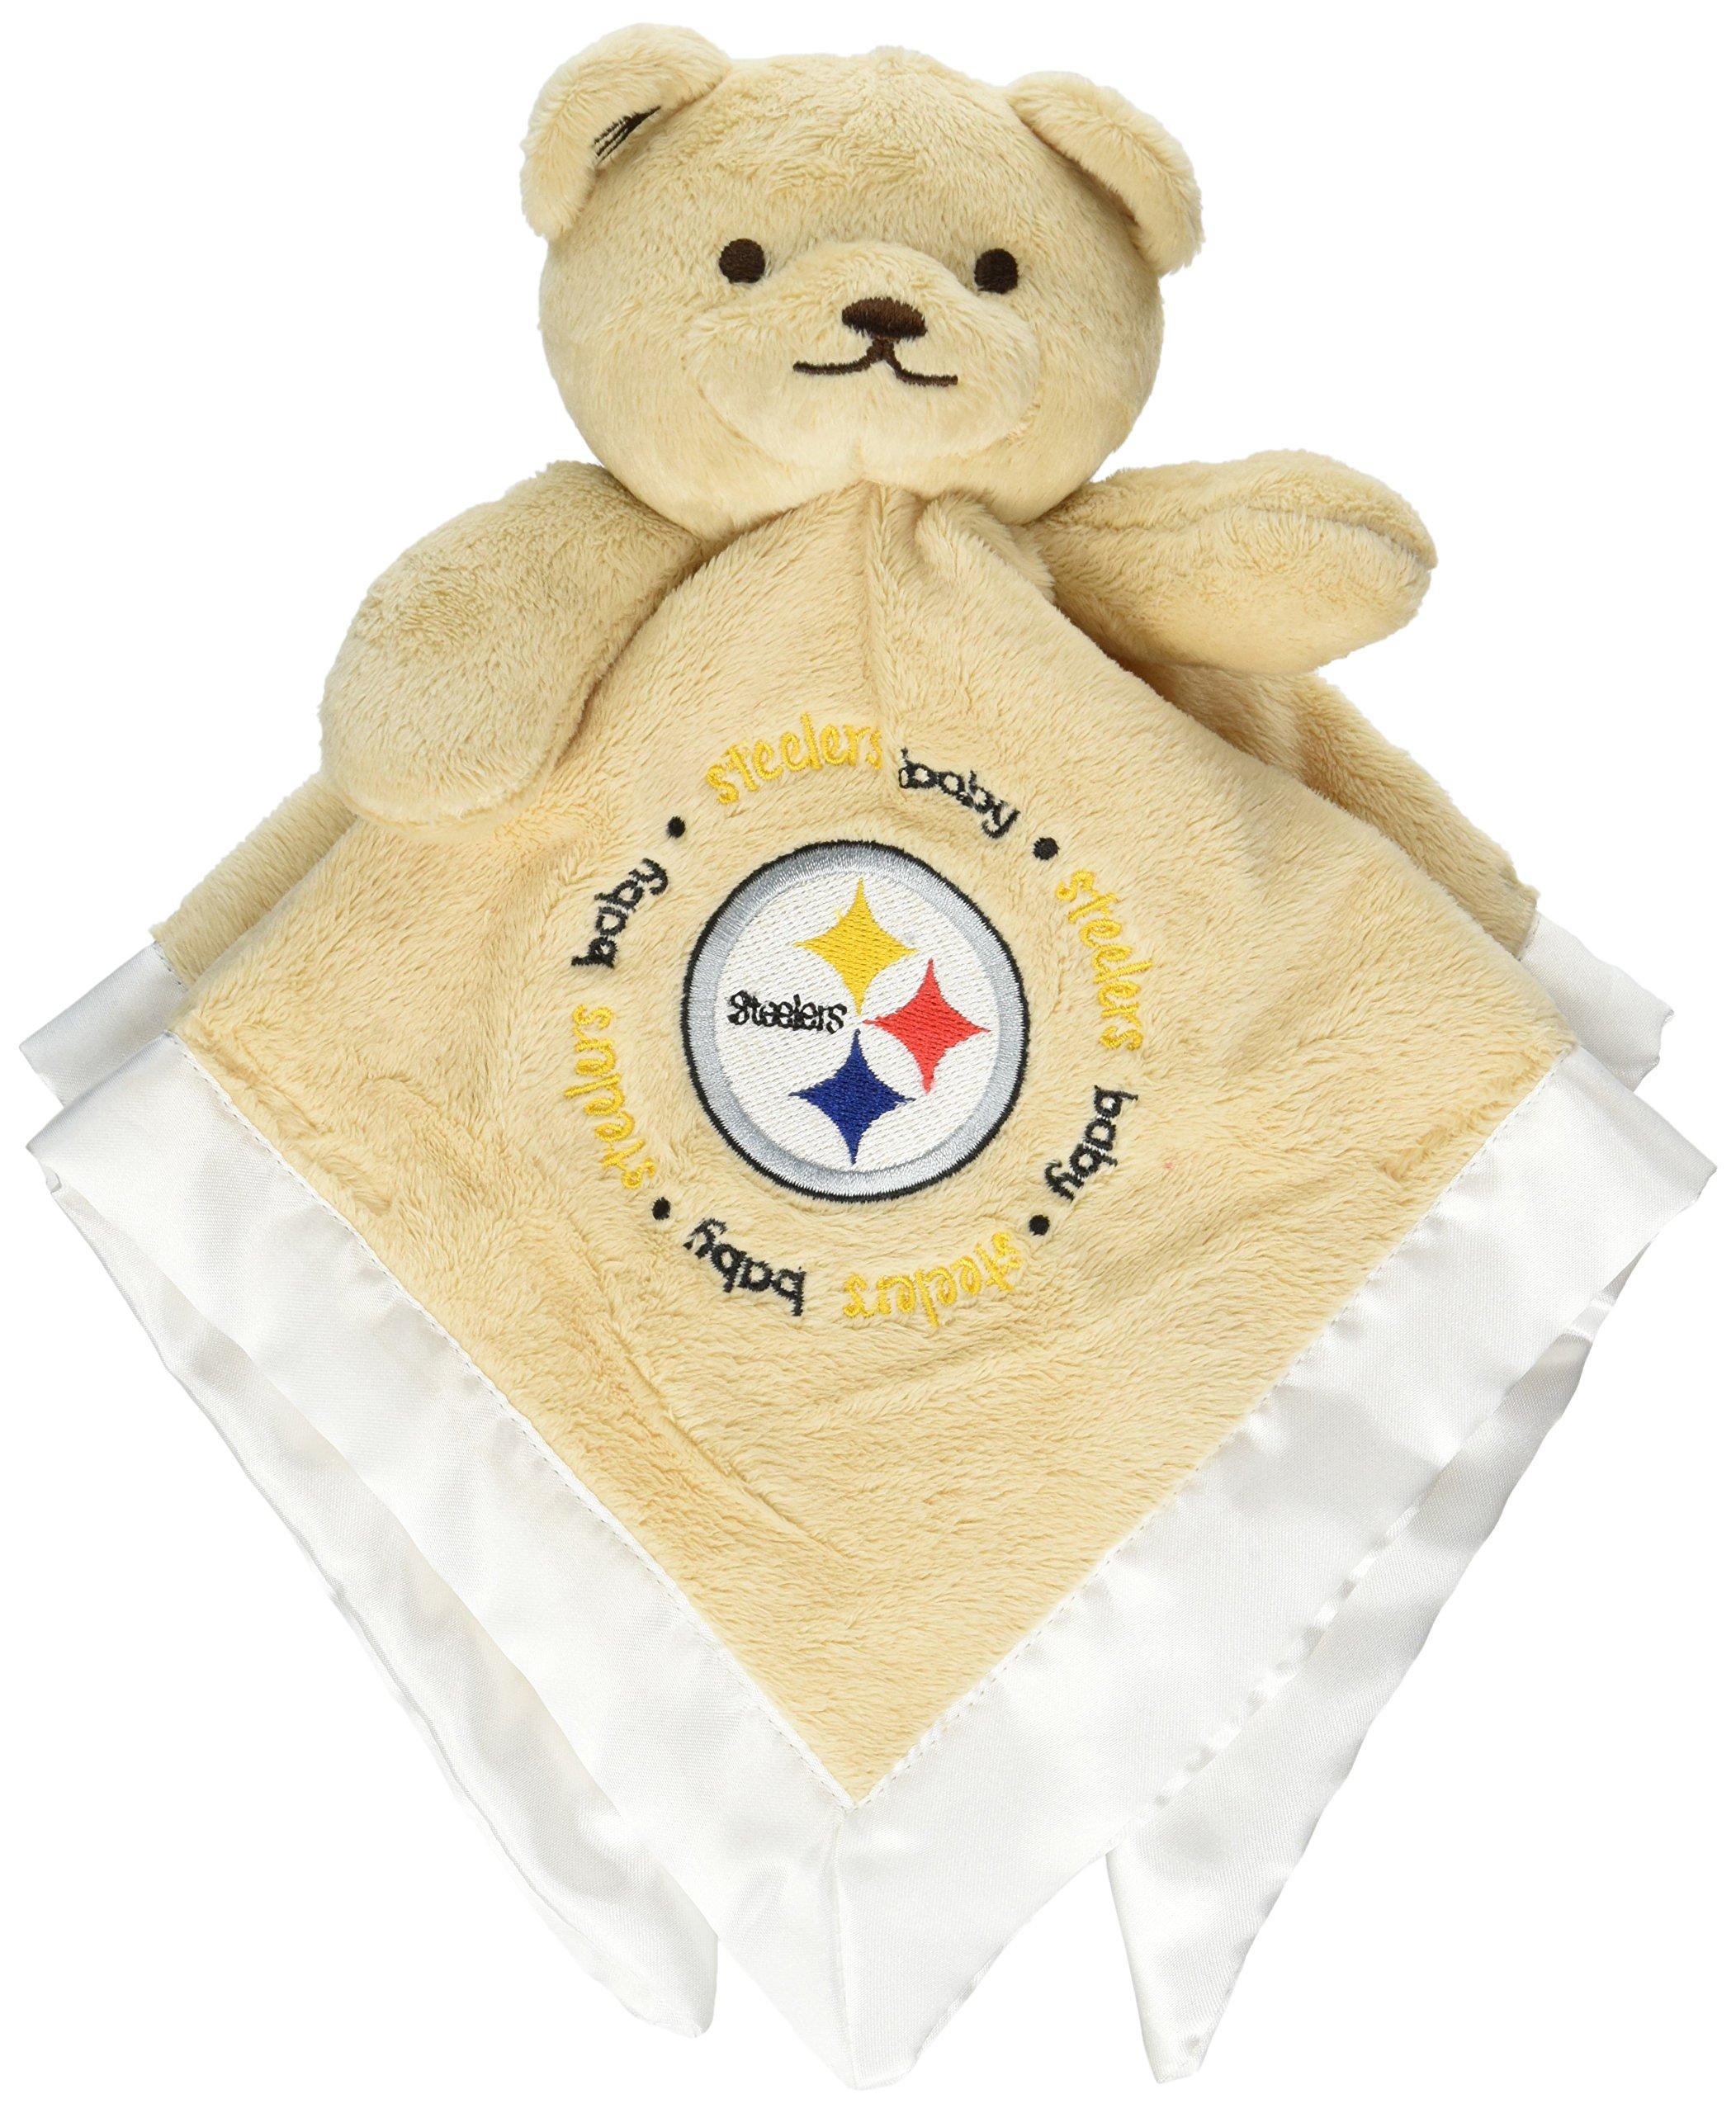 dffd0c9b5 Amazon.com  NFL Pittsburgh Steelers Baby Fanatic Snuggle Bear  Baby